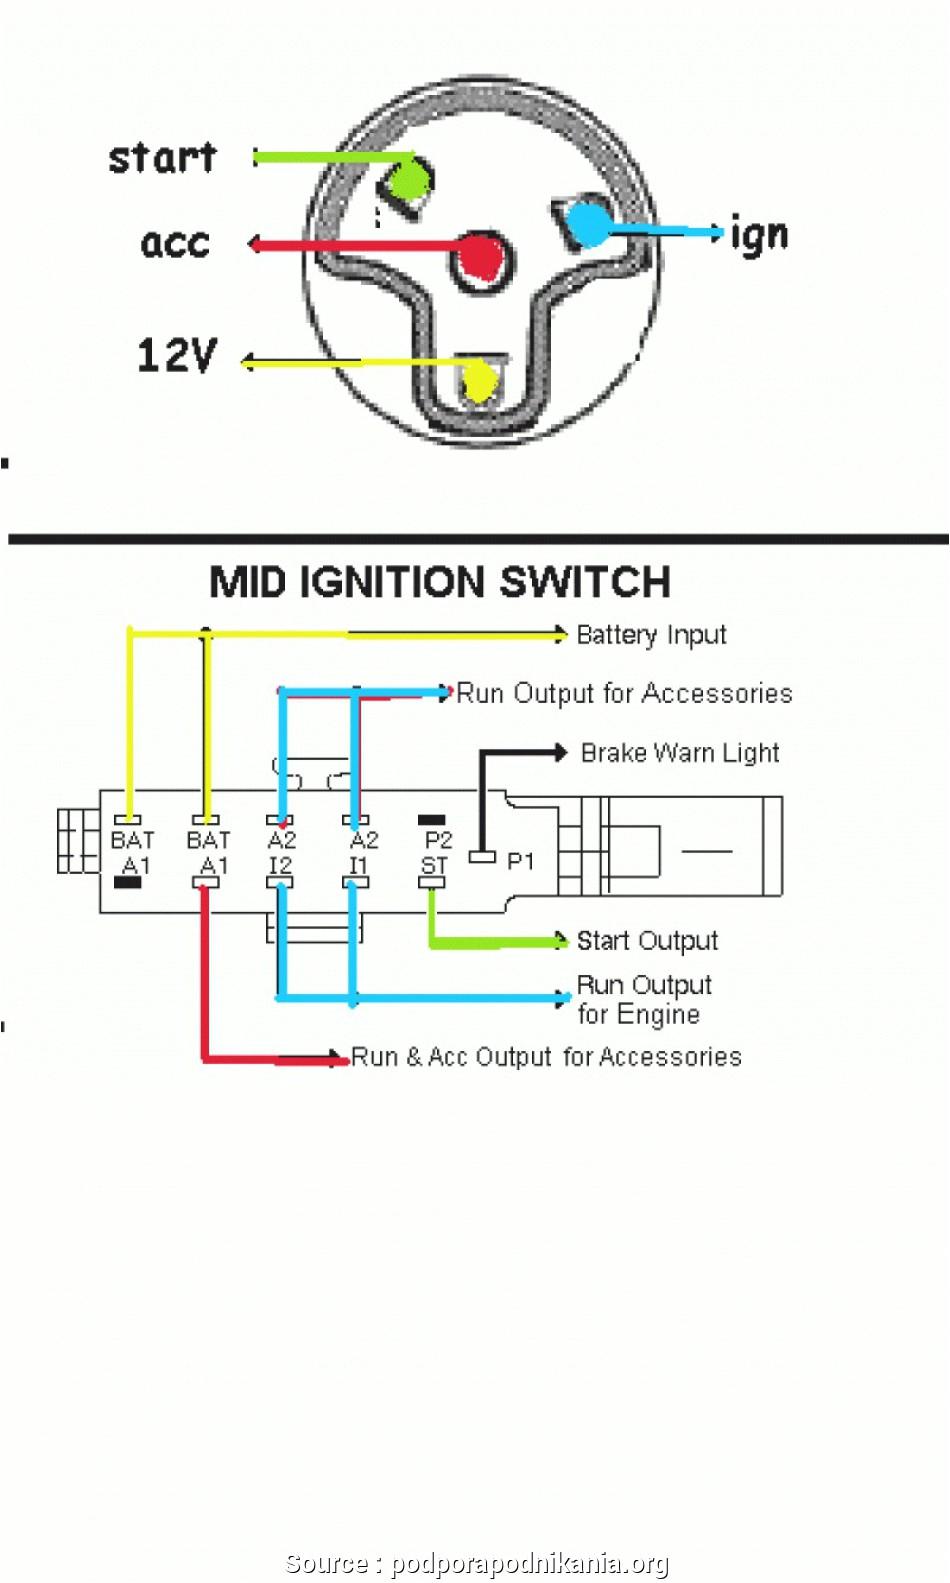 universal starter switch wiring diagram universal ignition switch wiring diagram teamninjaz me roc org best of starter 74 13421 jpg